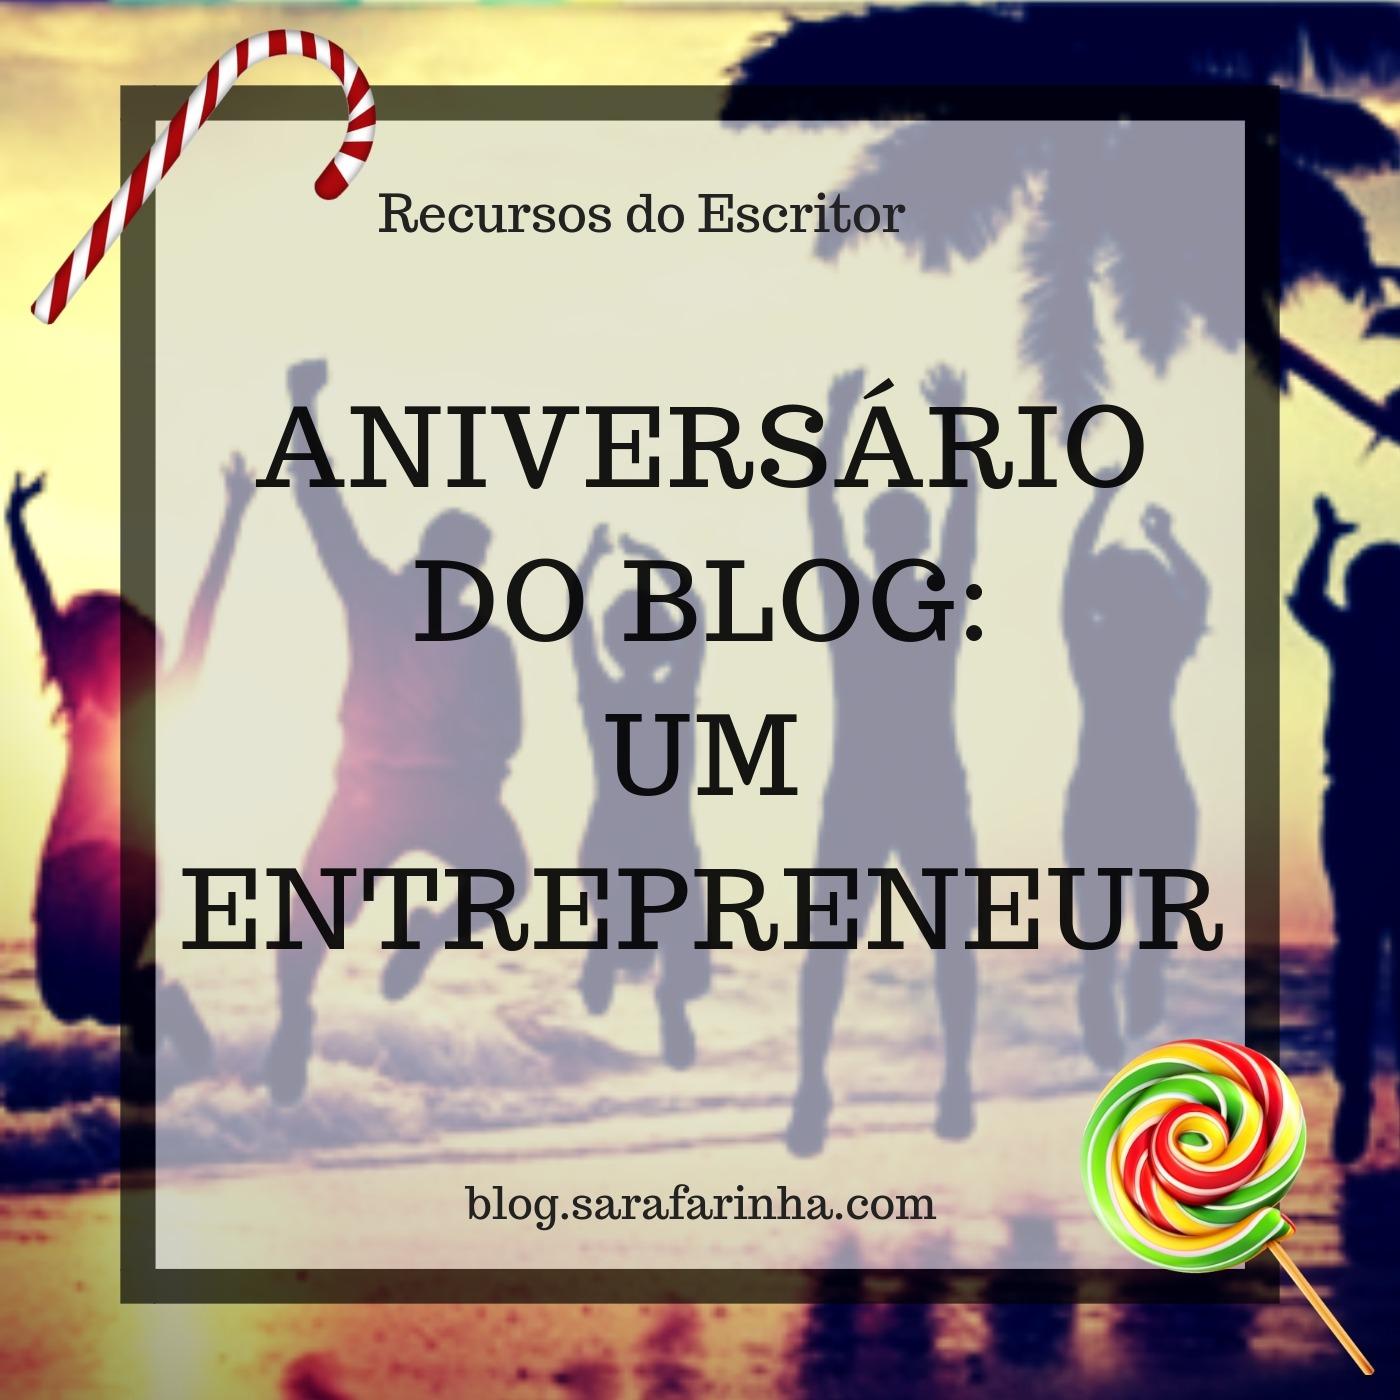 um entrepreneur